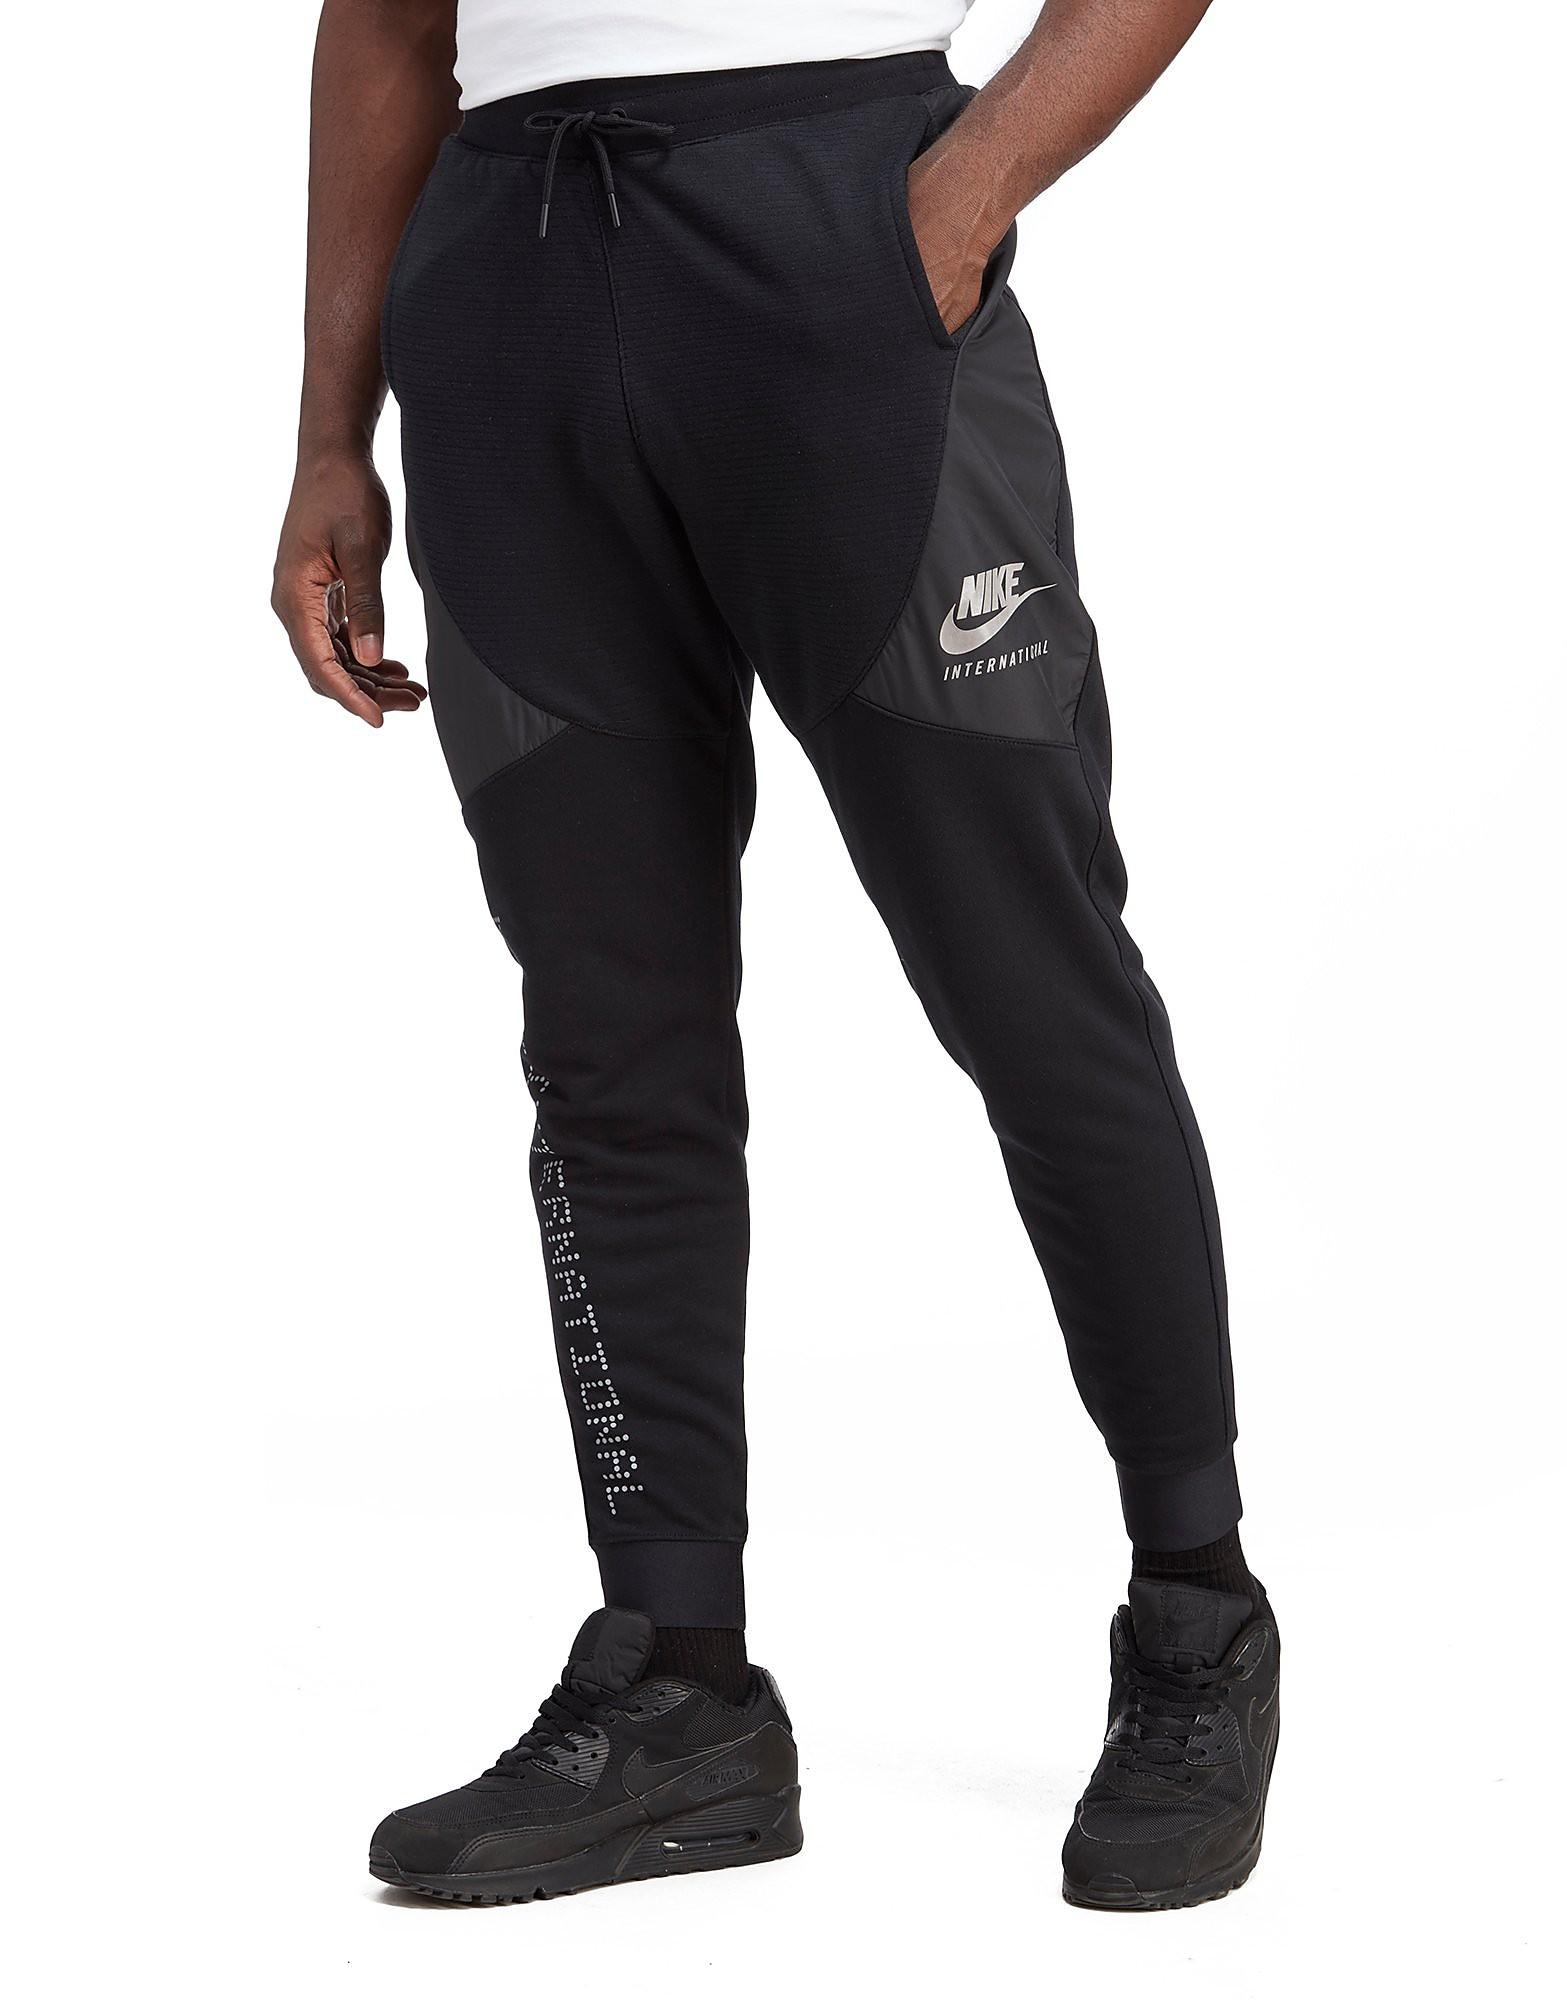 Nike International Pants